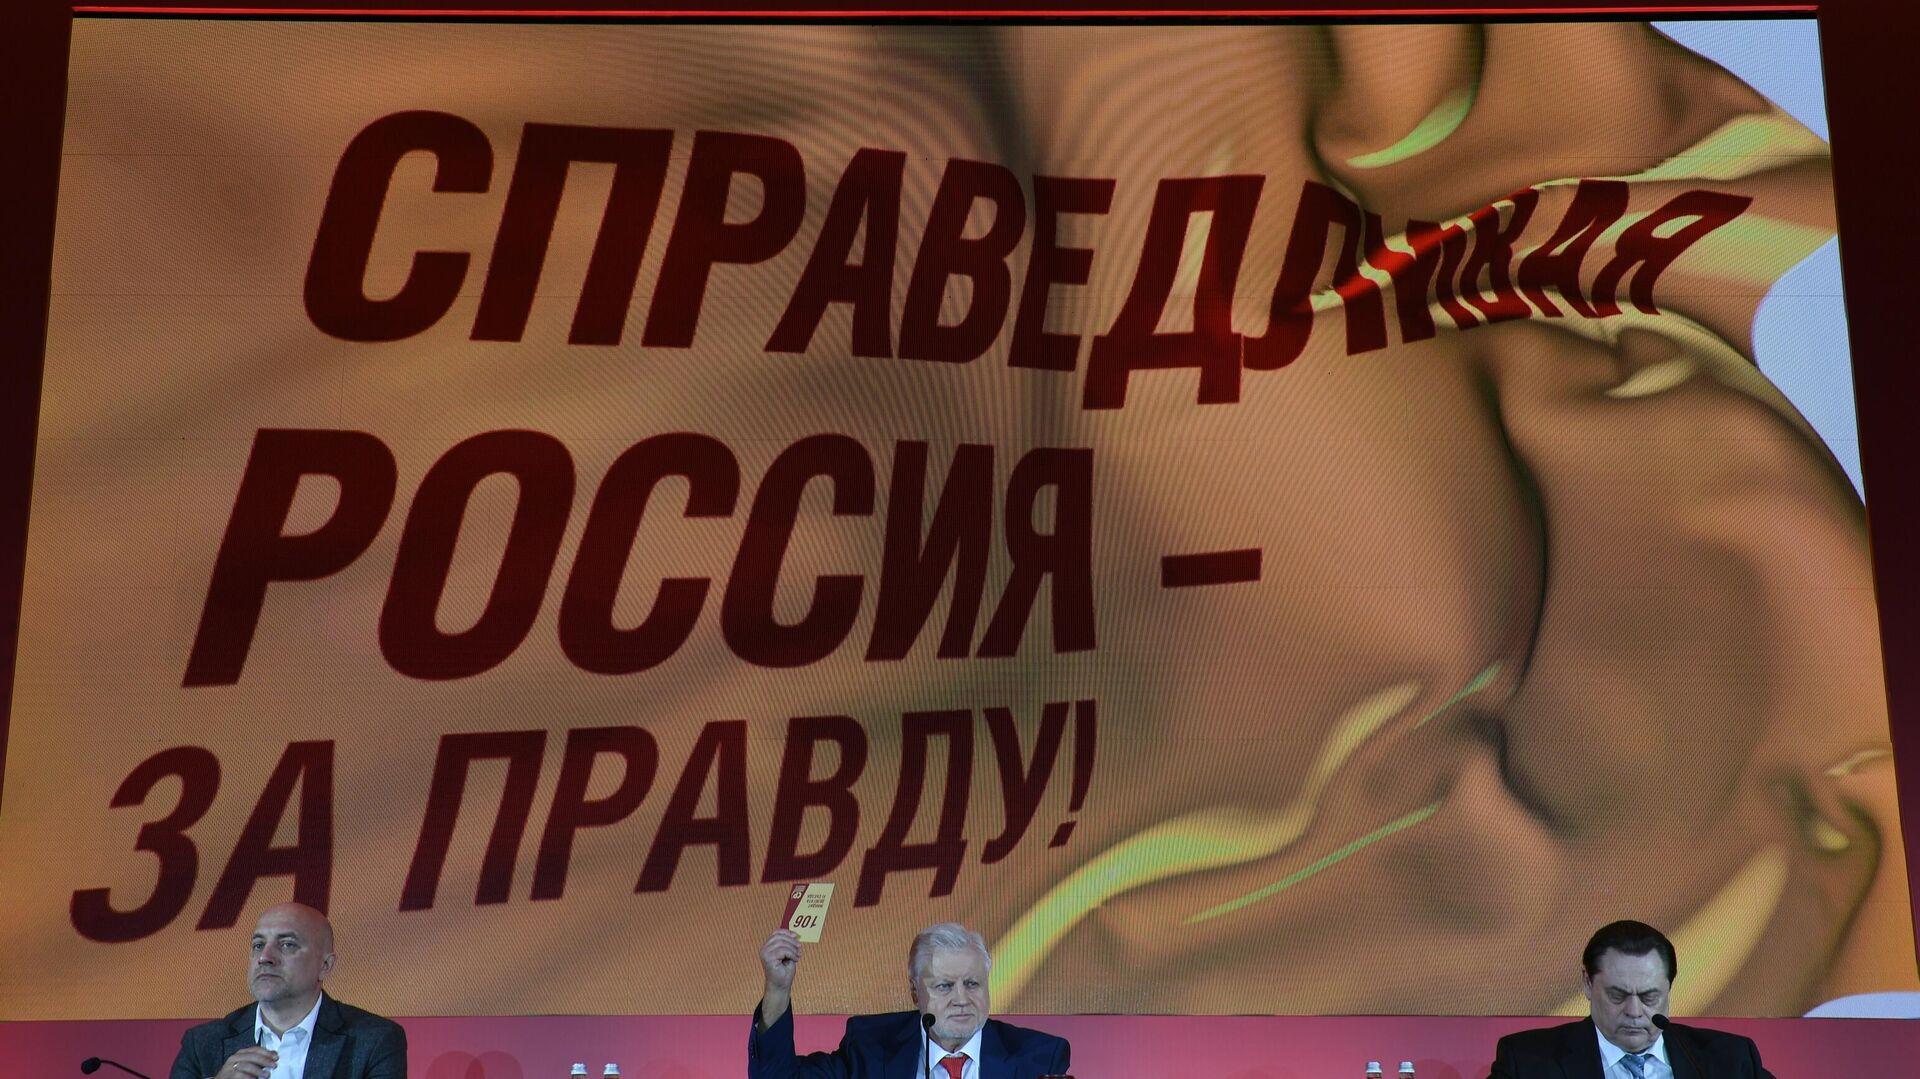 Съезд партии Справедливая Россия - За правду - РИА Новости, 1920, 26.06.2021